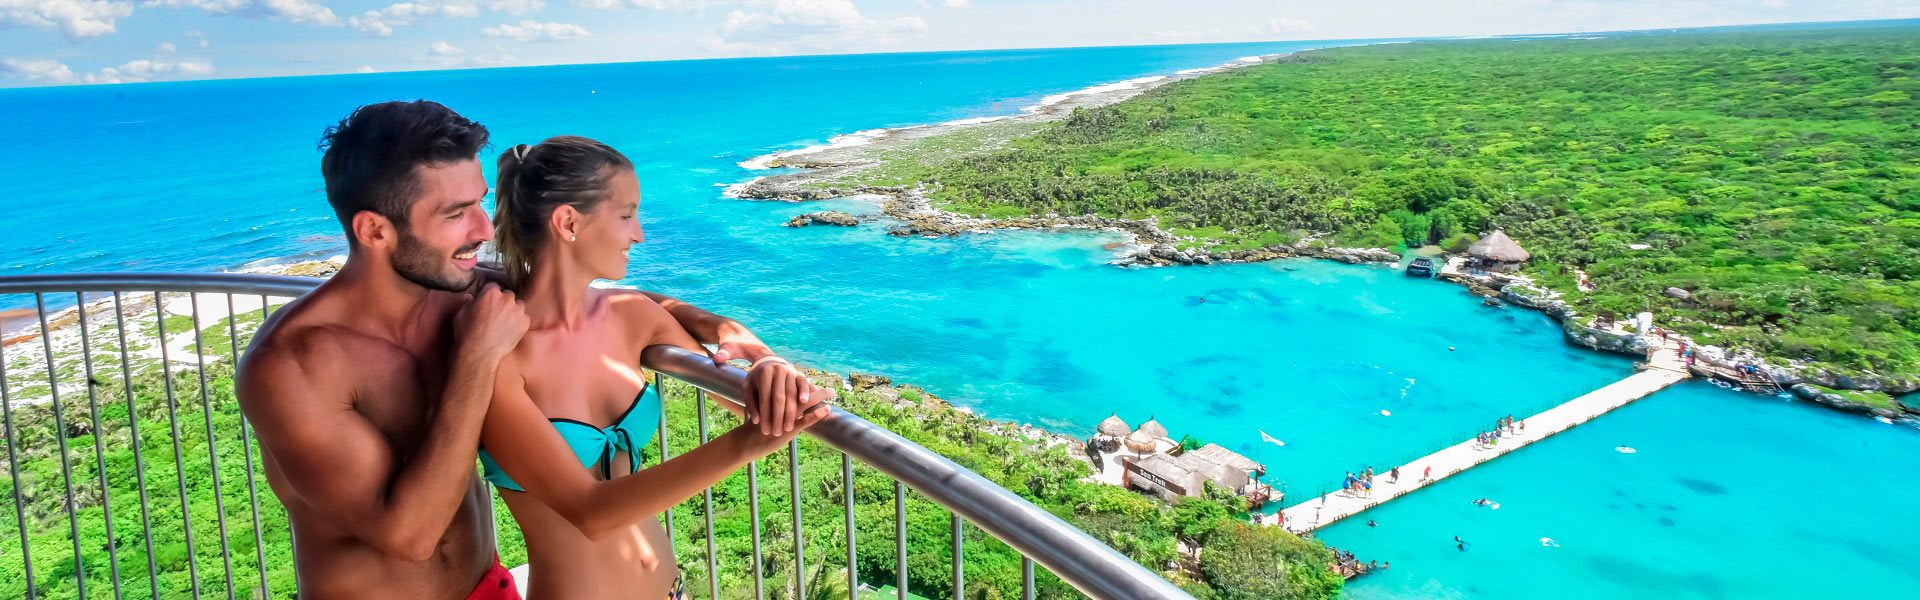 tourist enjoying the beach in the Mexican Caribbean